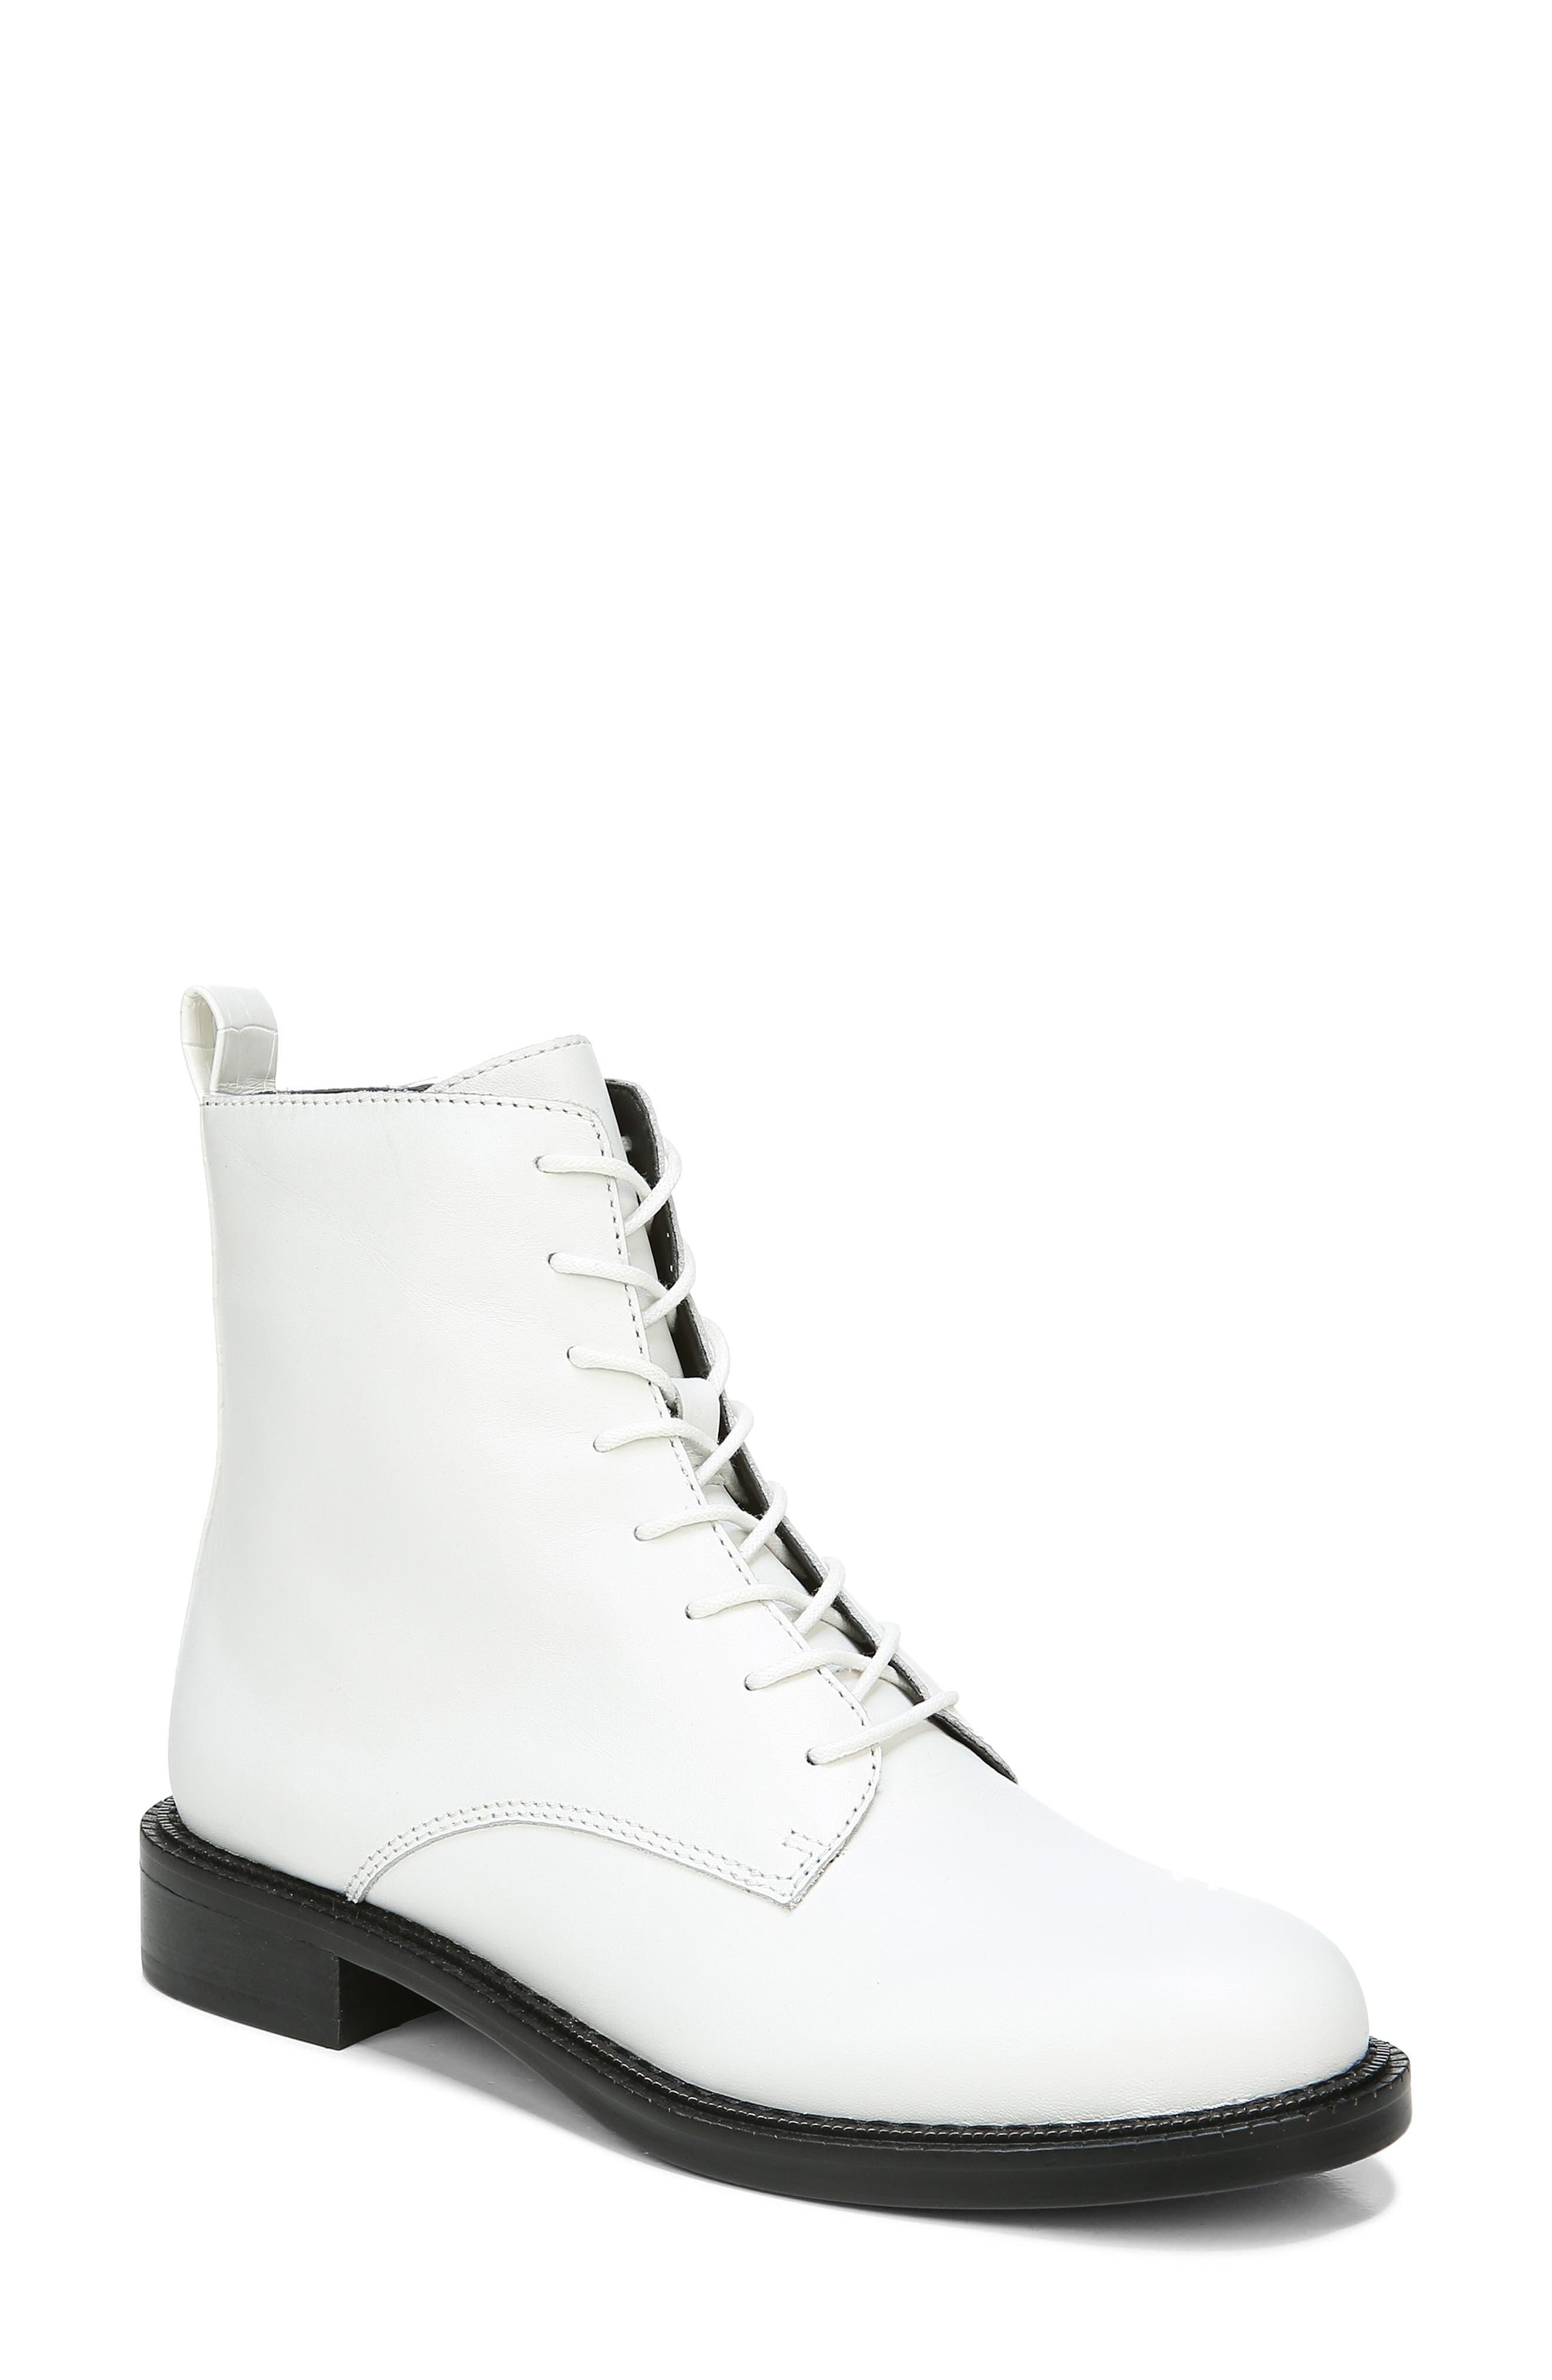 Women's White Boots | Nordstrom